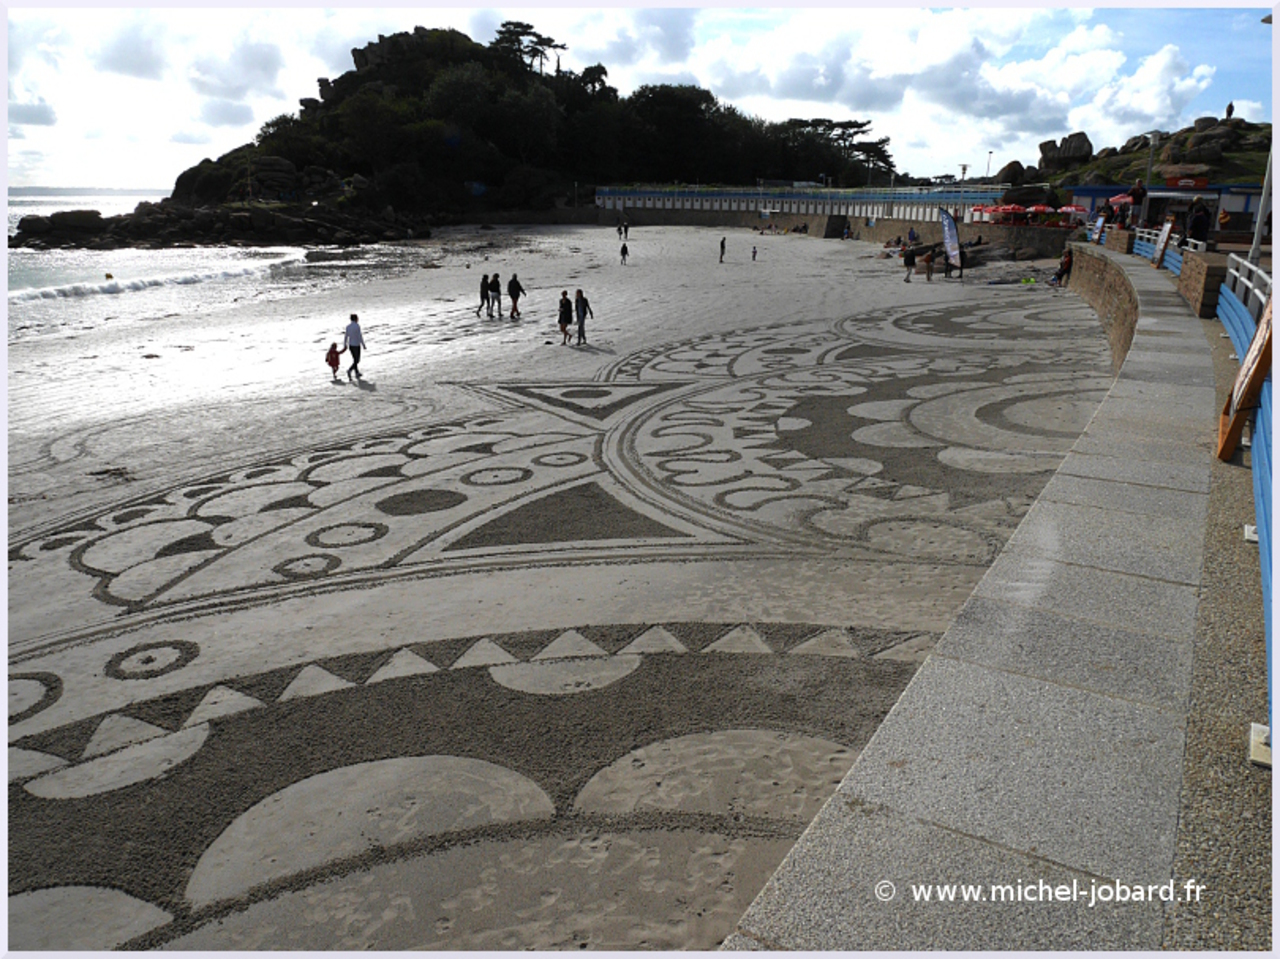 beach-art-dentelles-de-trebeurden-18-septembre-2016-02